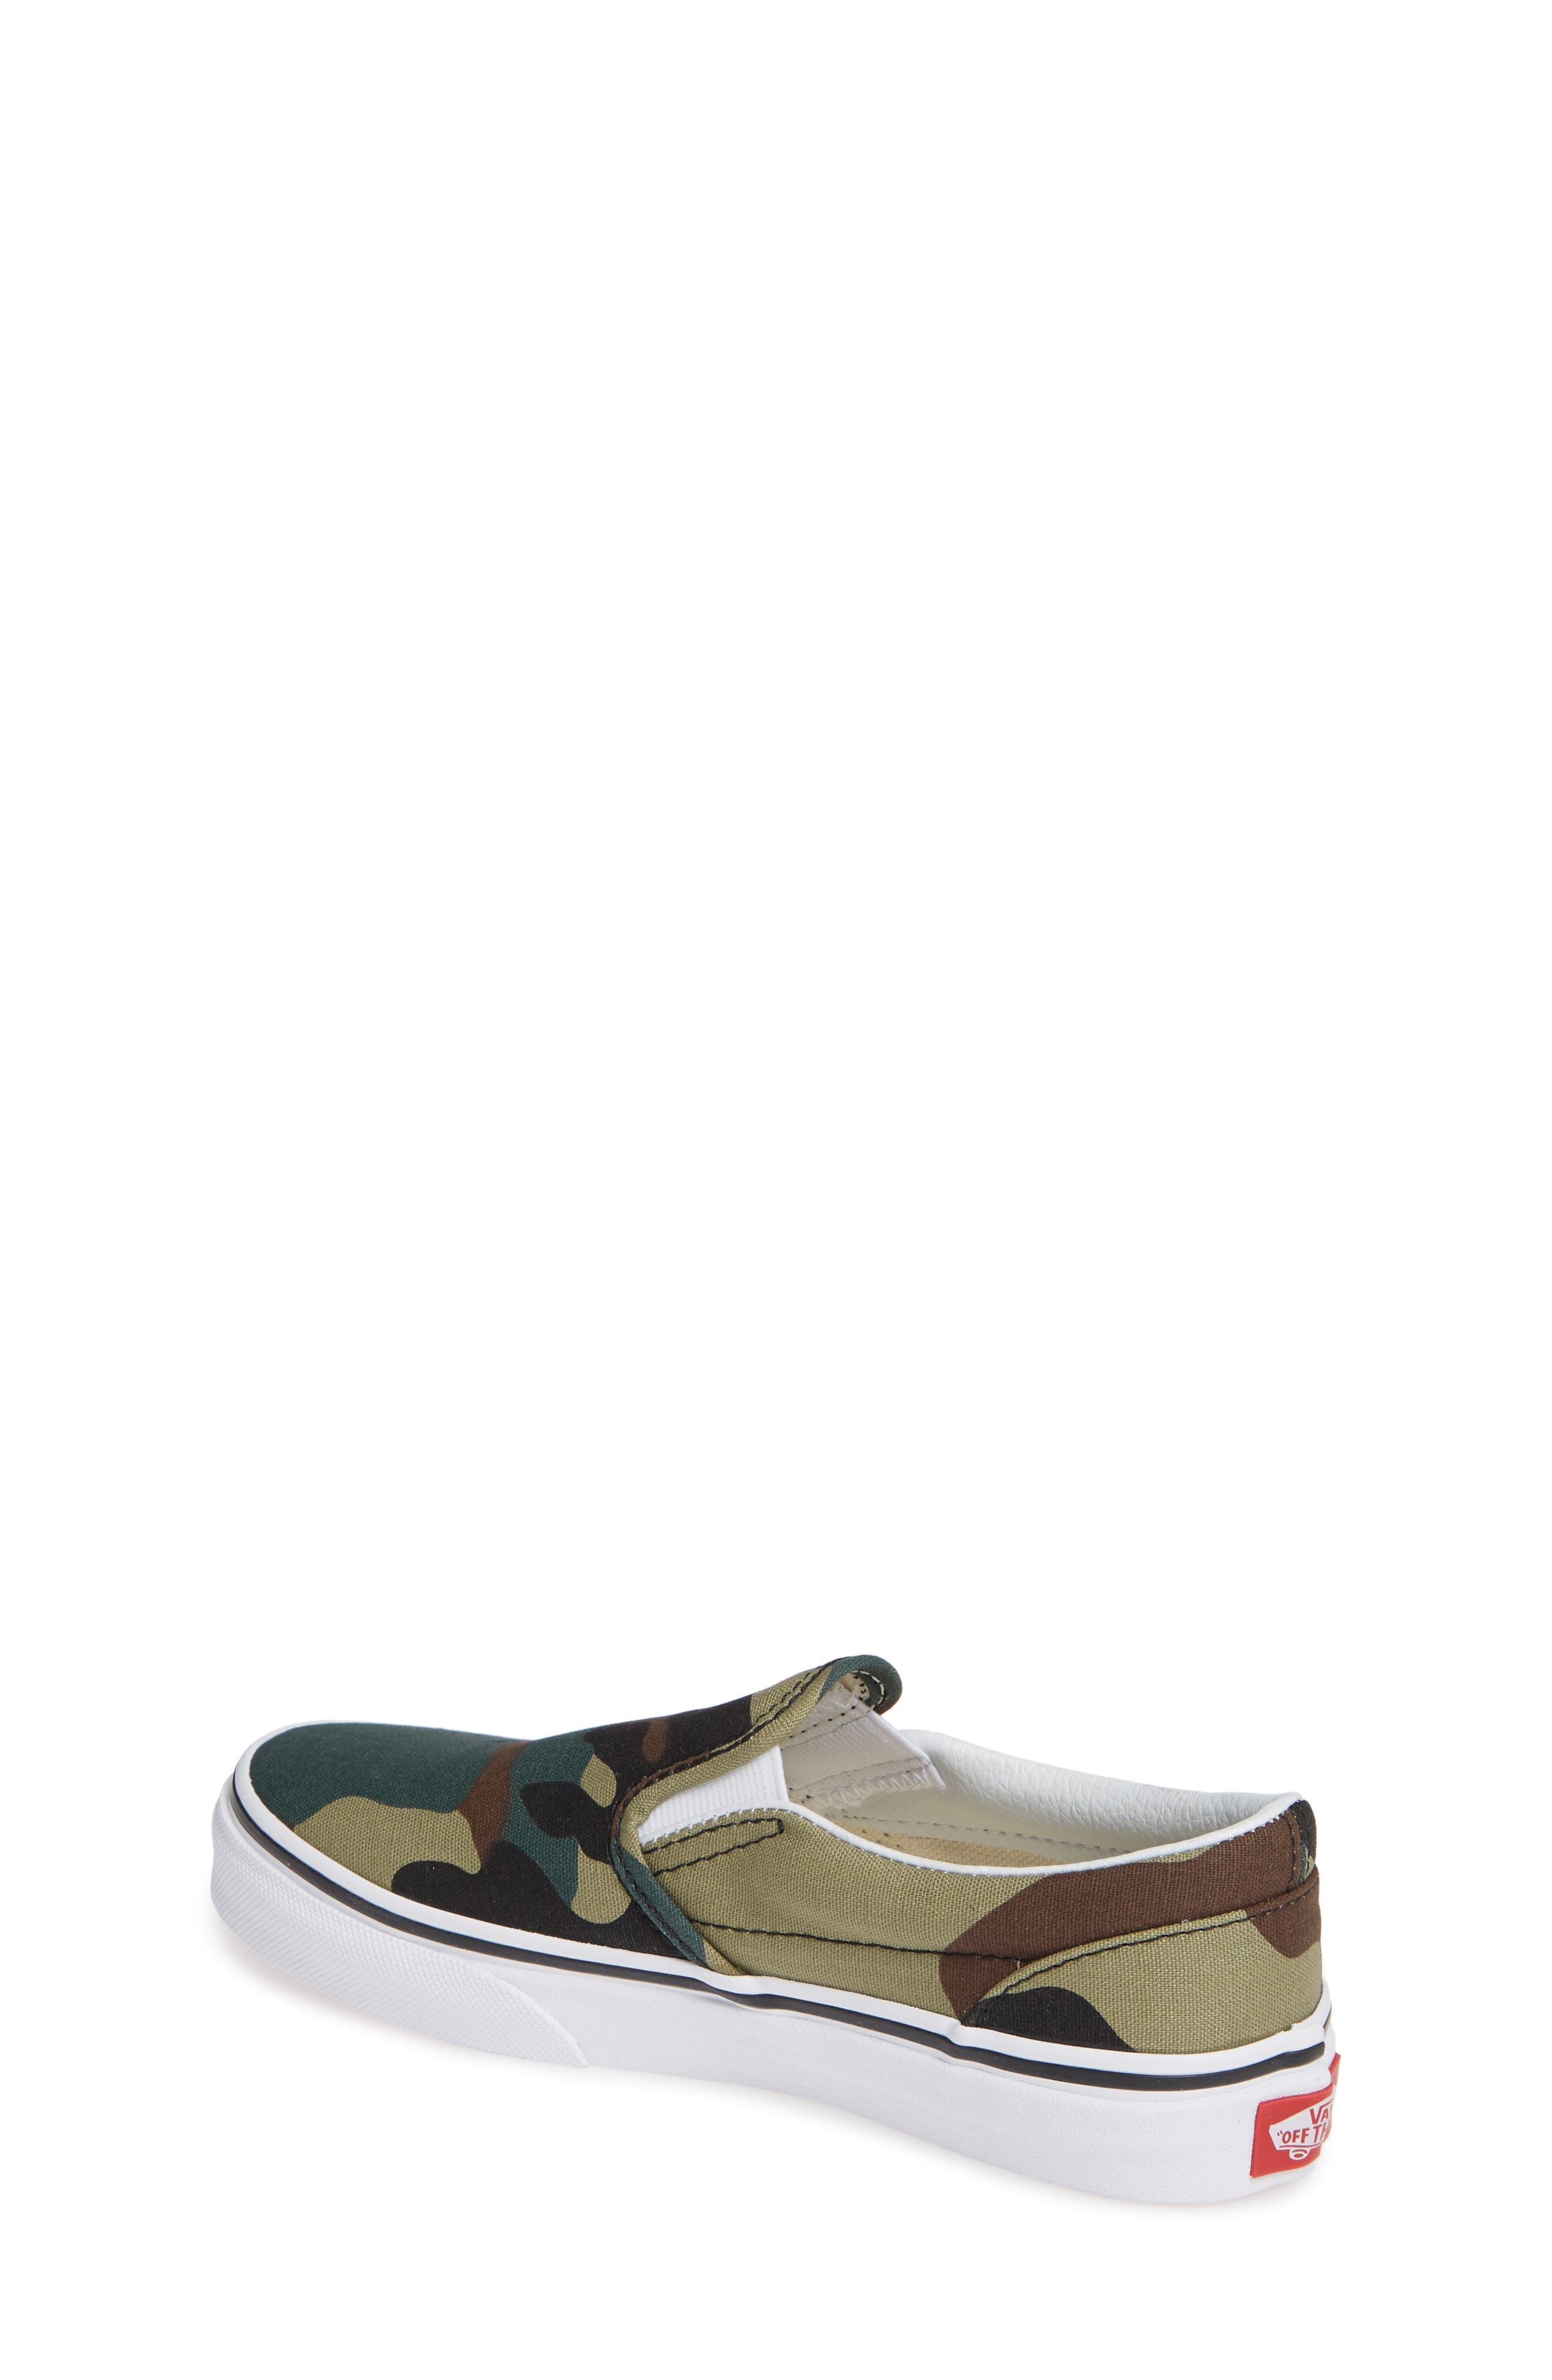 Classic Slip-On Sneaker,                             Alternate thumbnail 2, color,                             WOODLAND CAMO BLACK/ WOODLAND